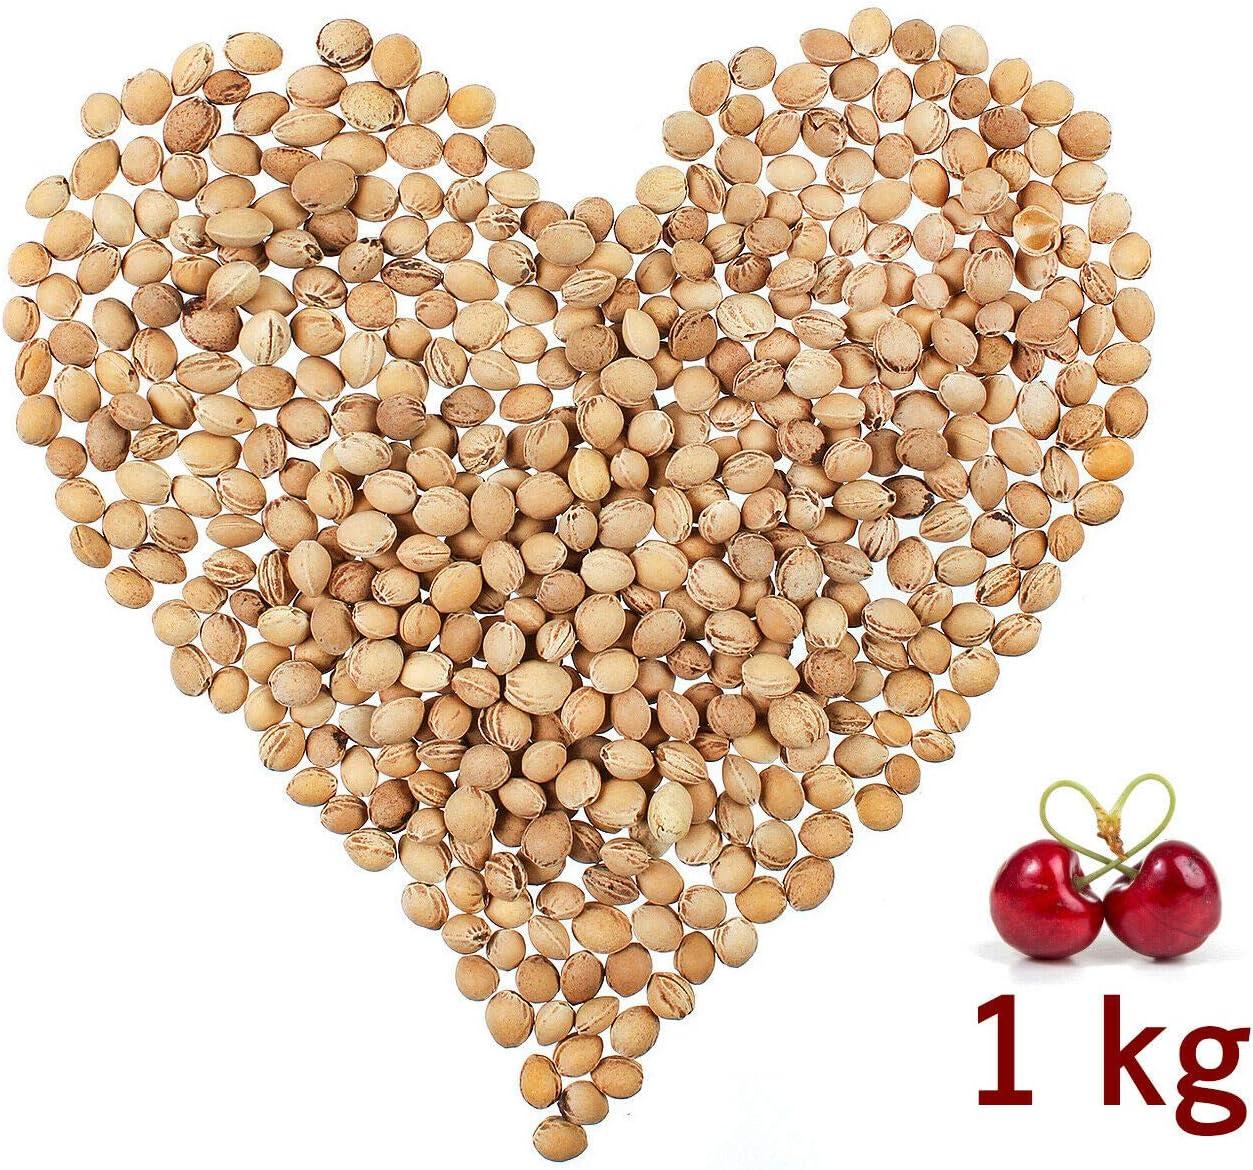 2/kg Eigenmarke Huesos de cereza para relleno de coj/ín